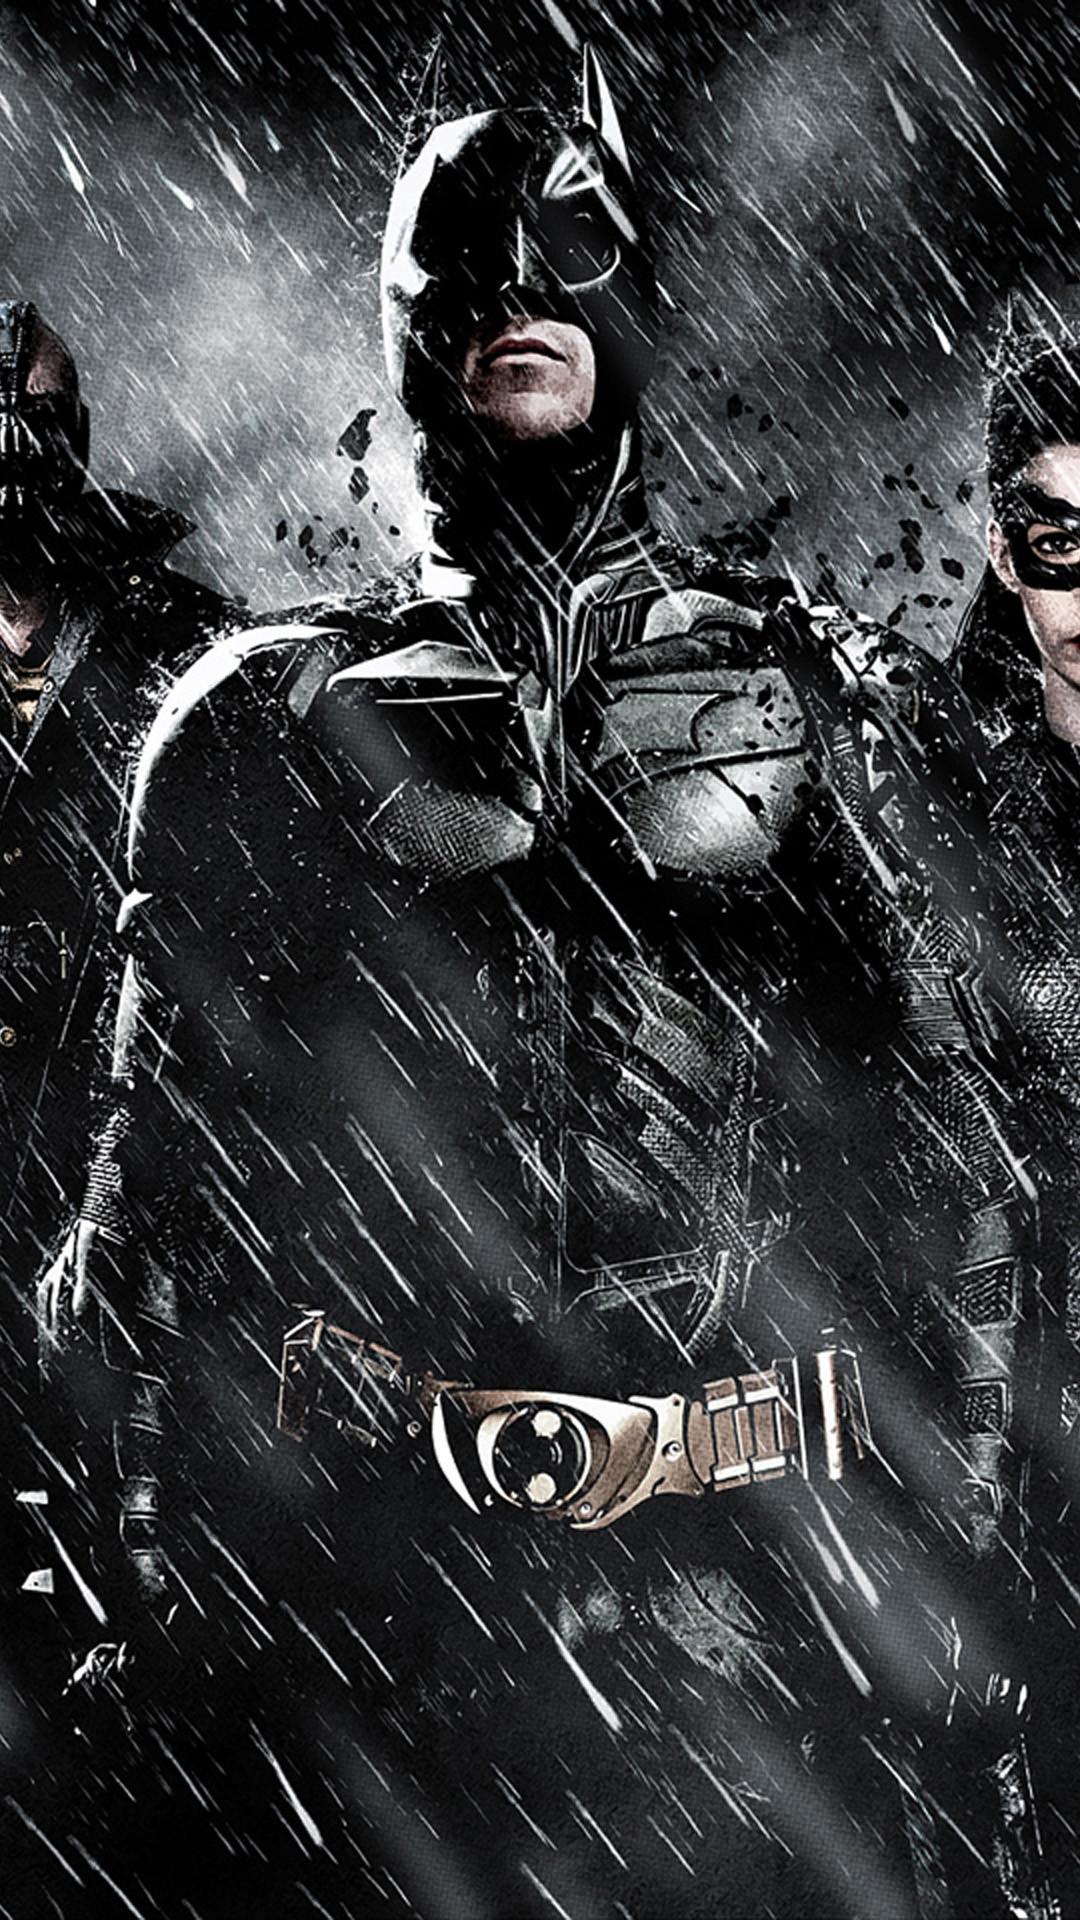 iPhone 6 plus Batman tdkr Games wallpaper.